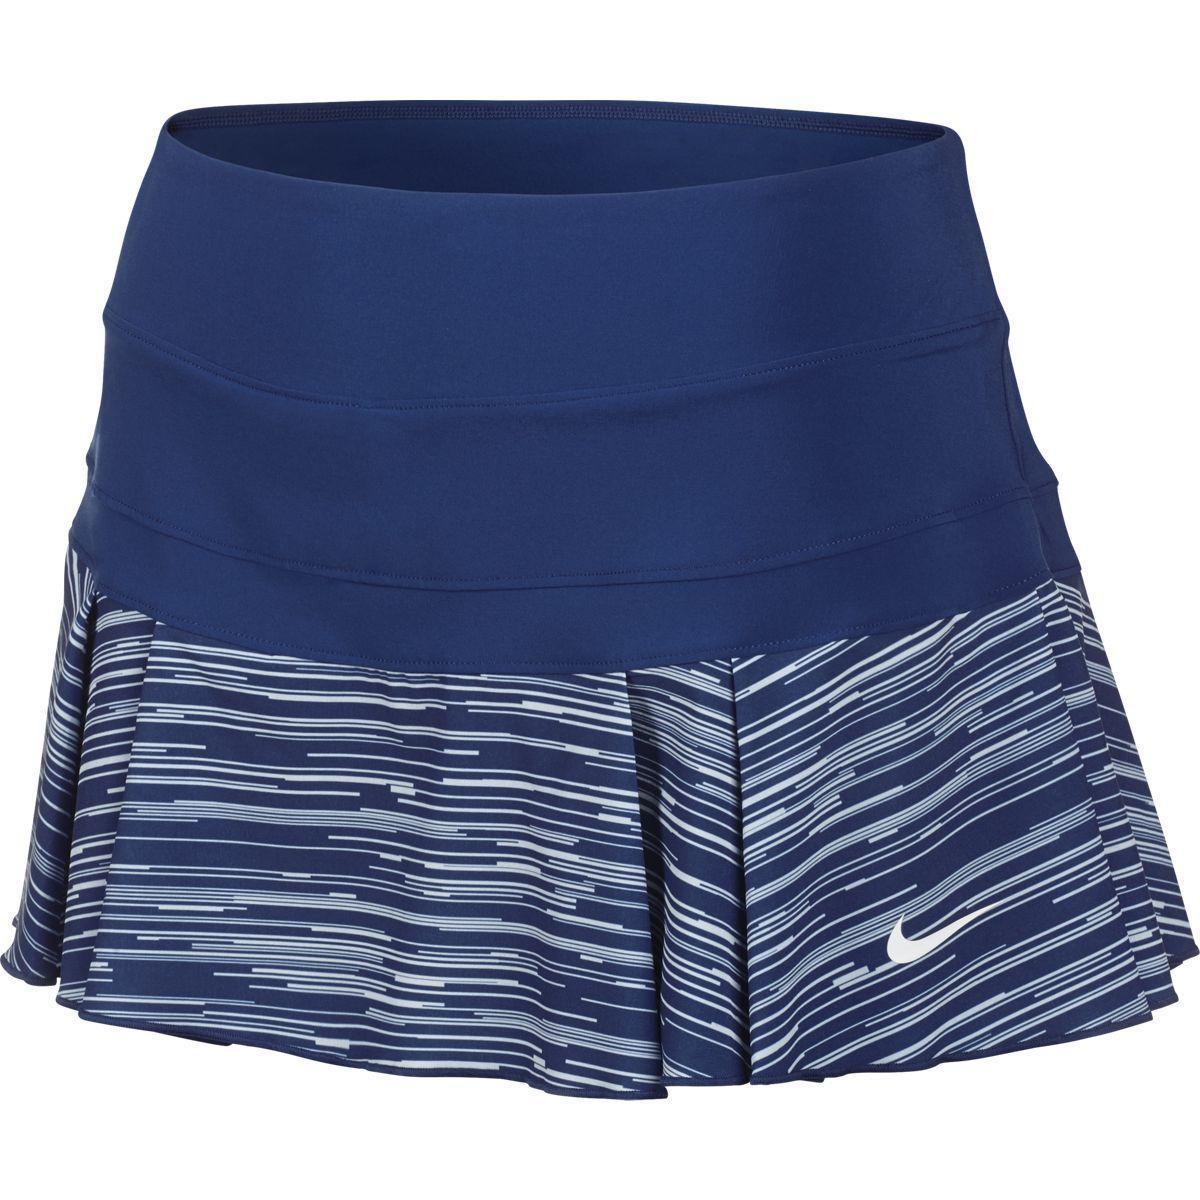 ce53840975 Nike Womens Victory Pleated Skirt - Blue - Tennisnuts.com